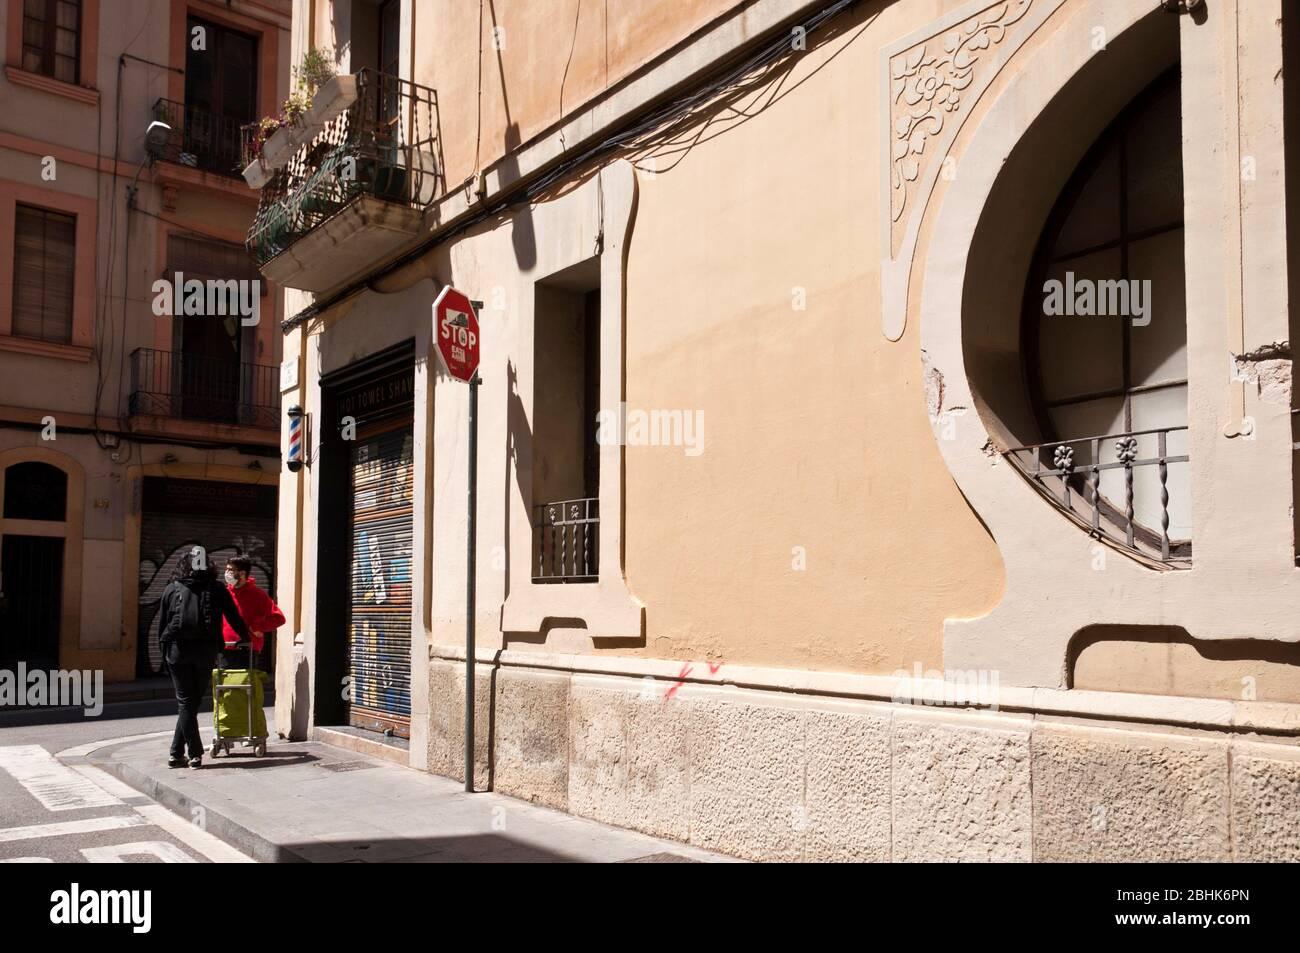 Dos personas con mascarillas charlan delante de tiendas cerradas por Cuarentena, 25 abril 2020, Gracia, Barcelona, España. Stock Photo